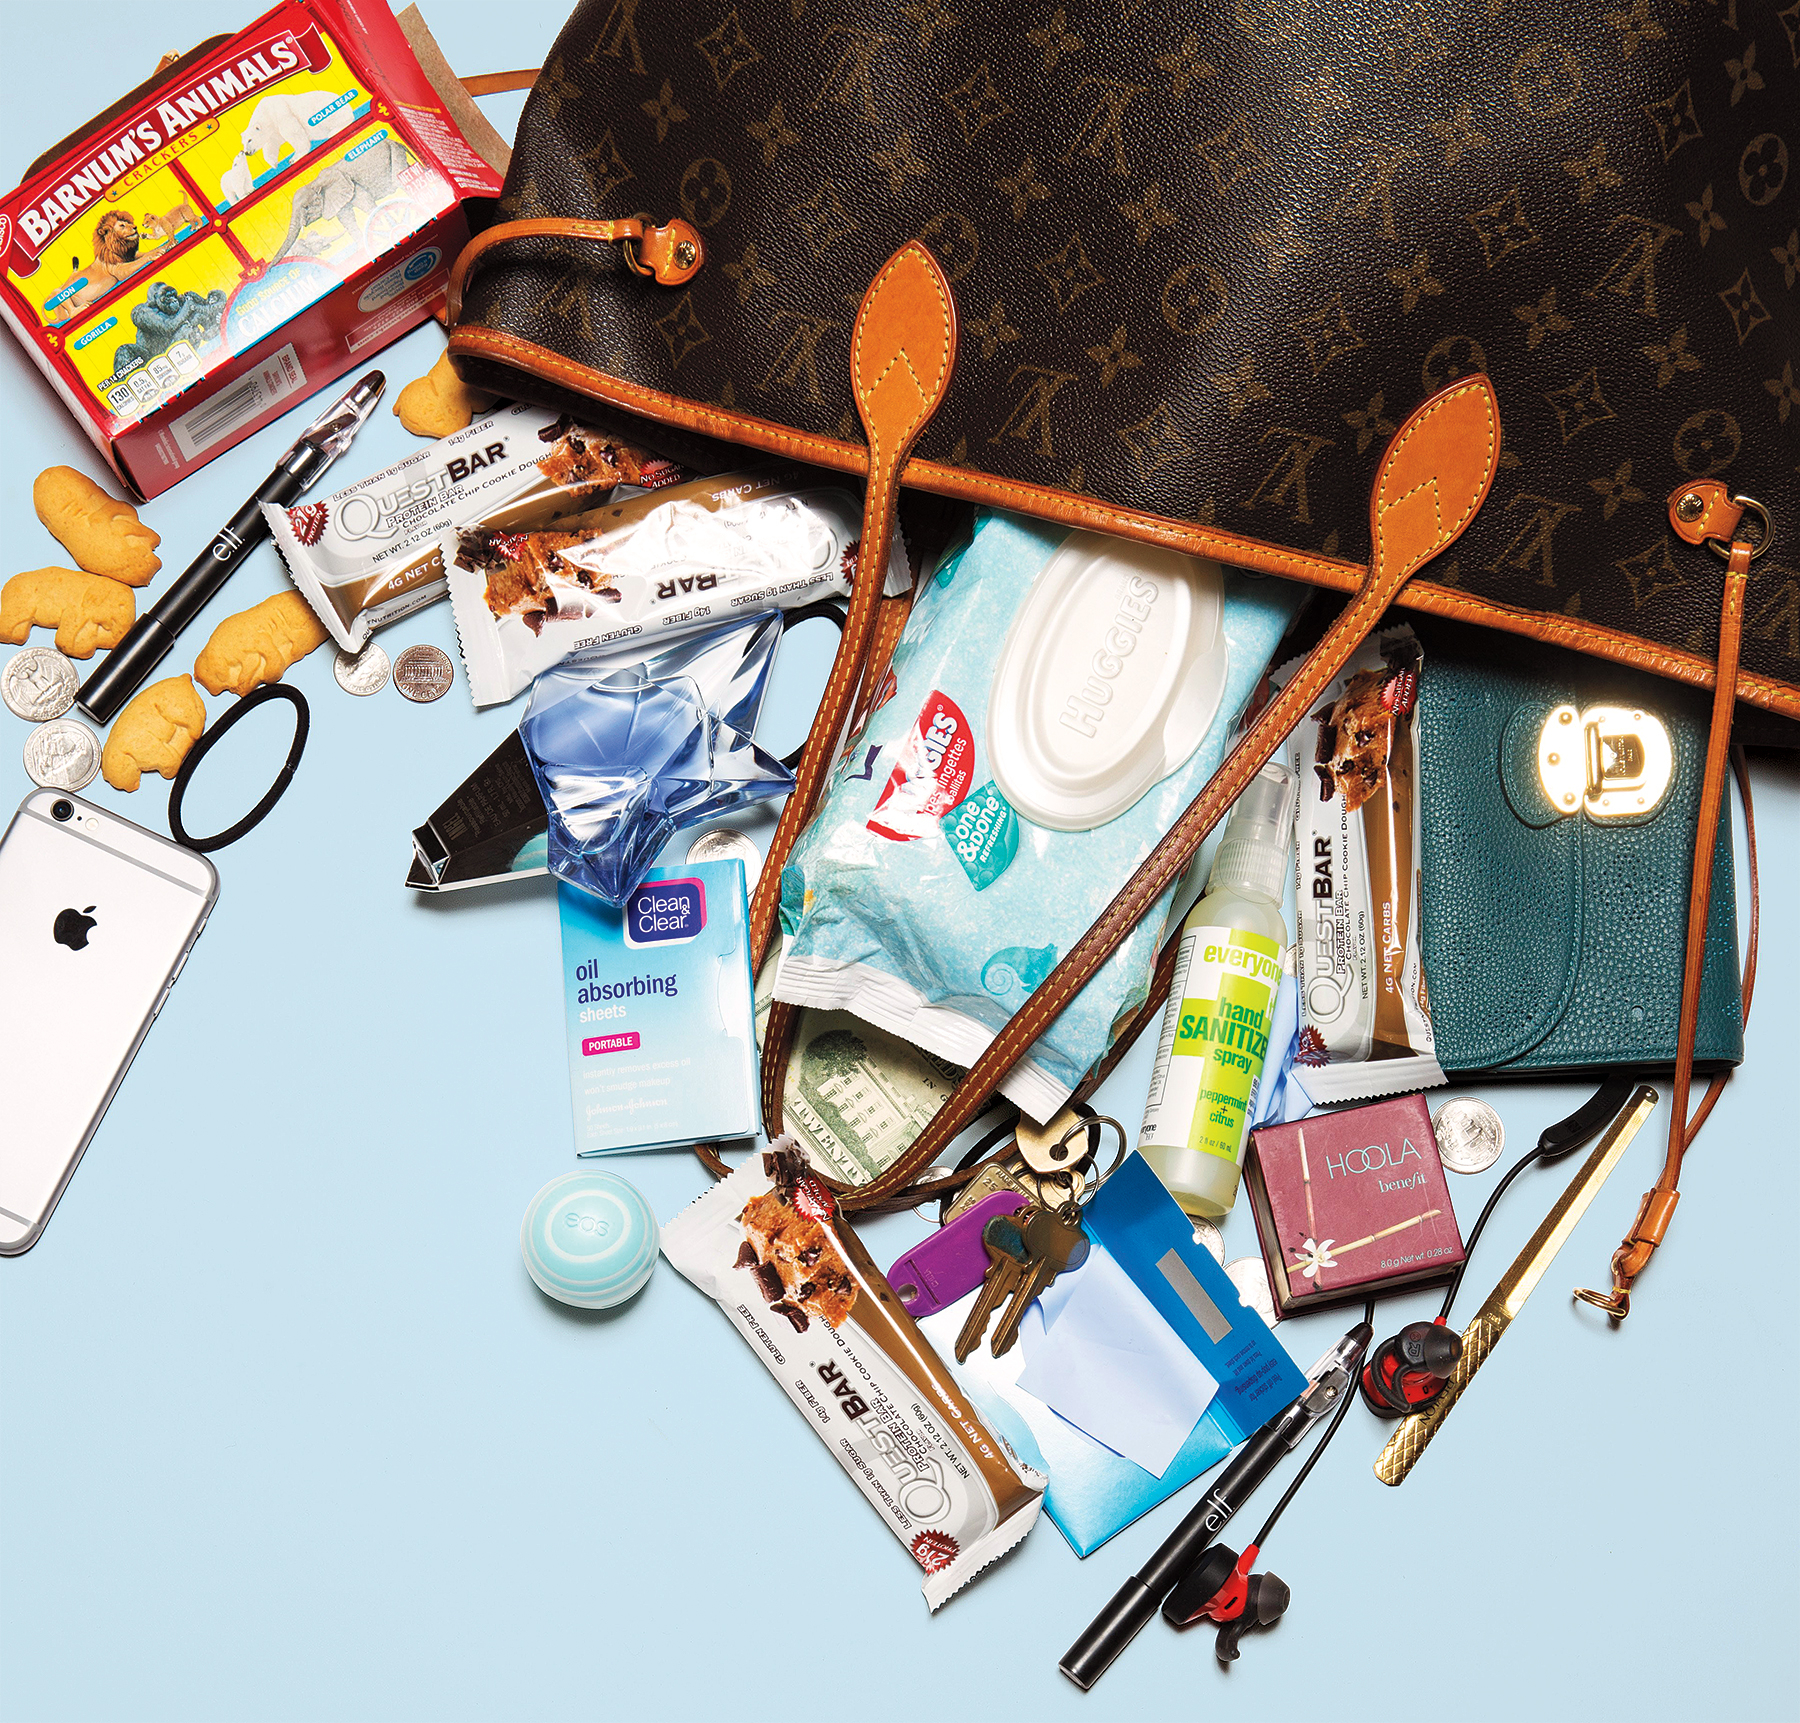 Melissa Rycroft's bag